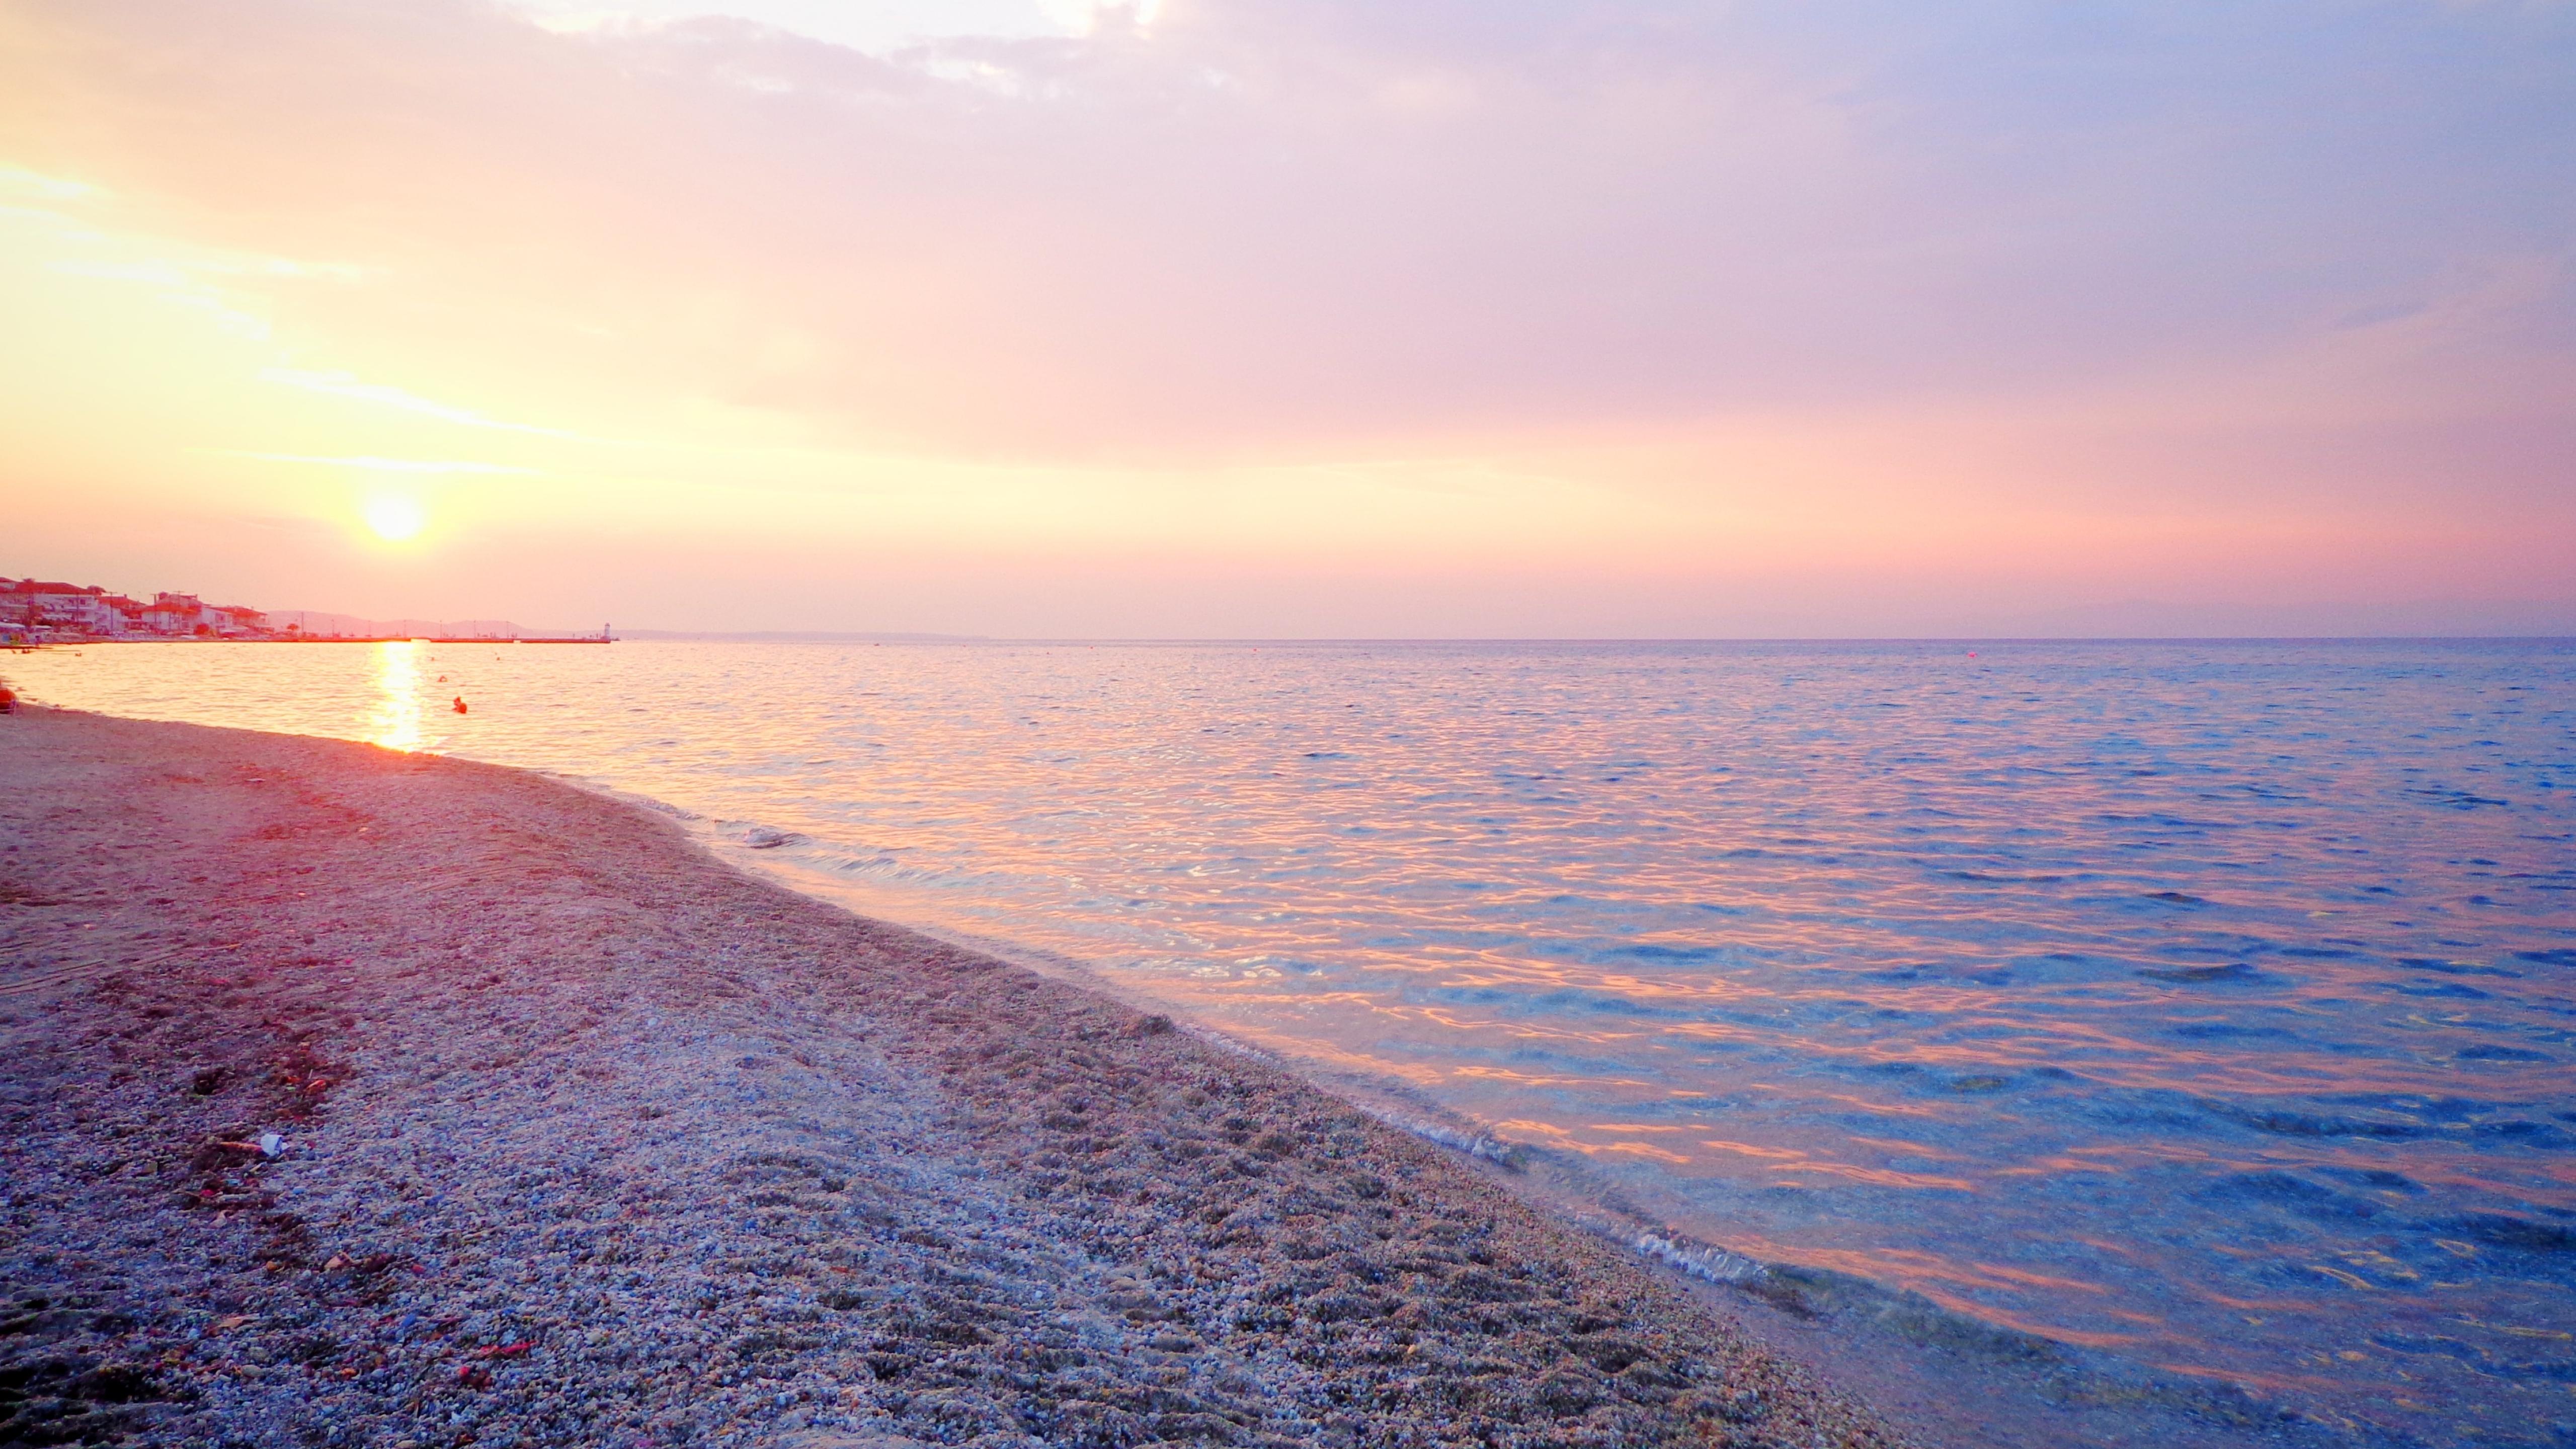 5120x2880 Greece Sea Beach 5k Wallpaper Hd Nature 4k